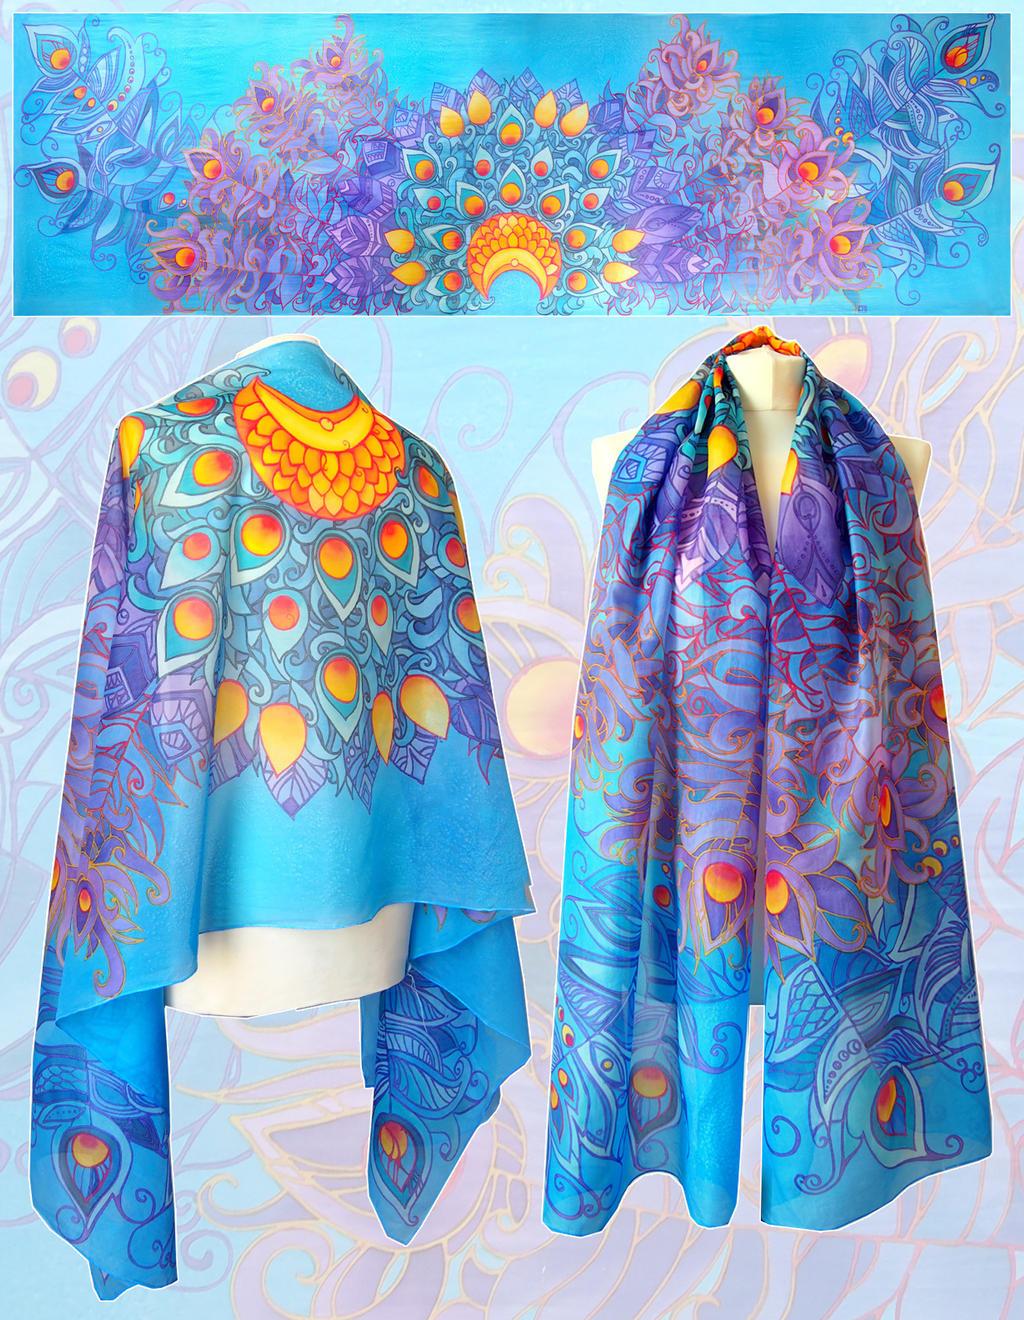 Peacock Feathers silk scarf by MinkuLul